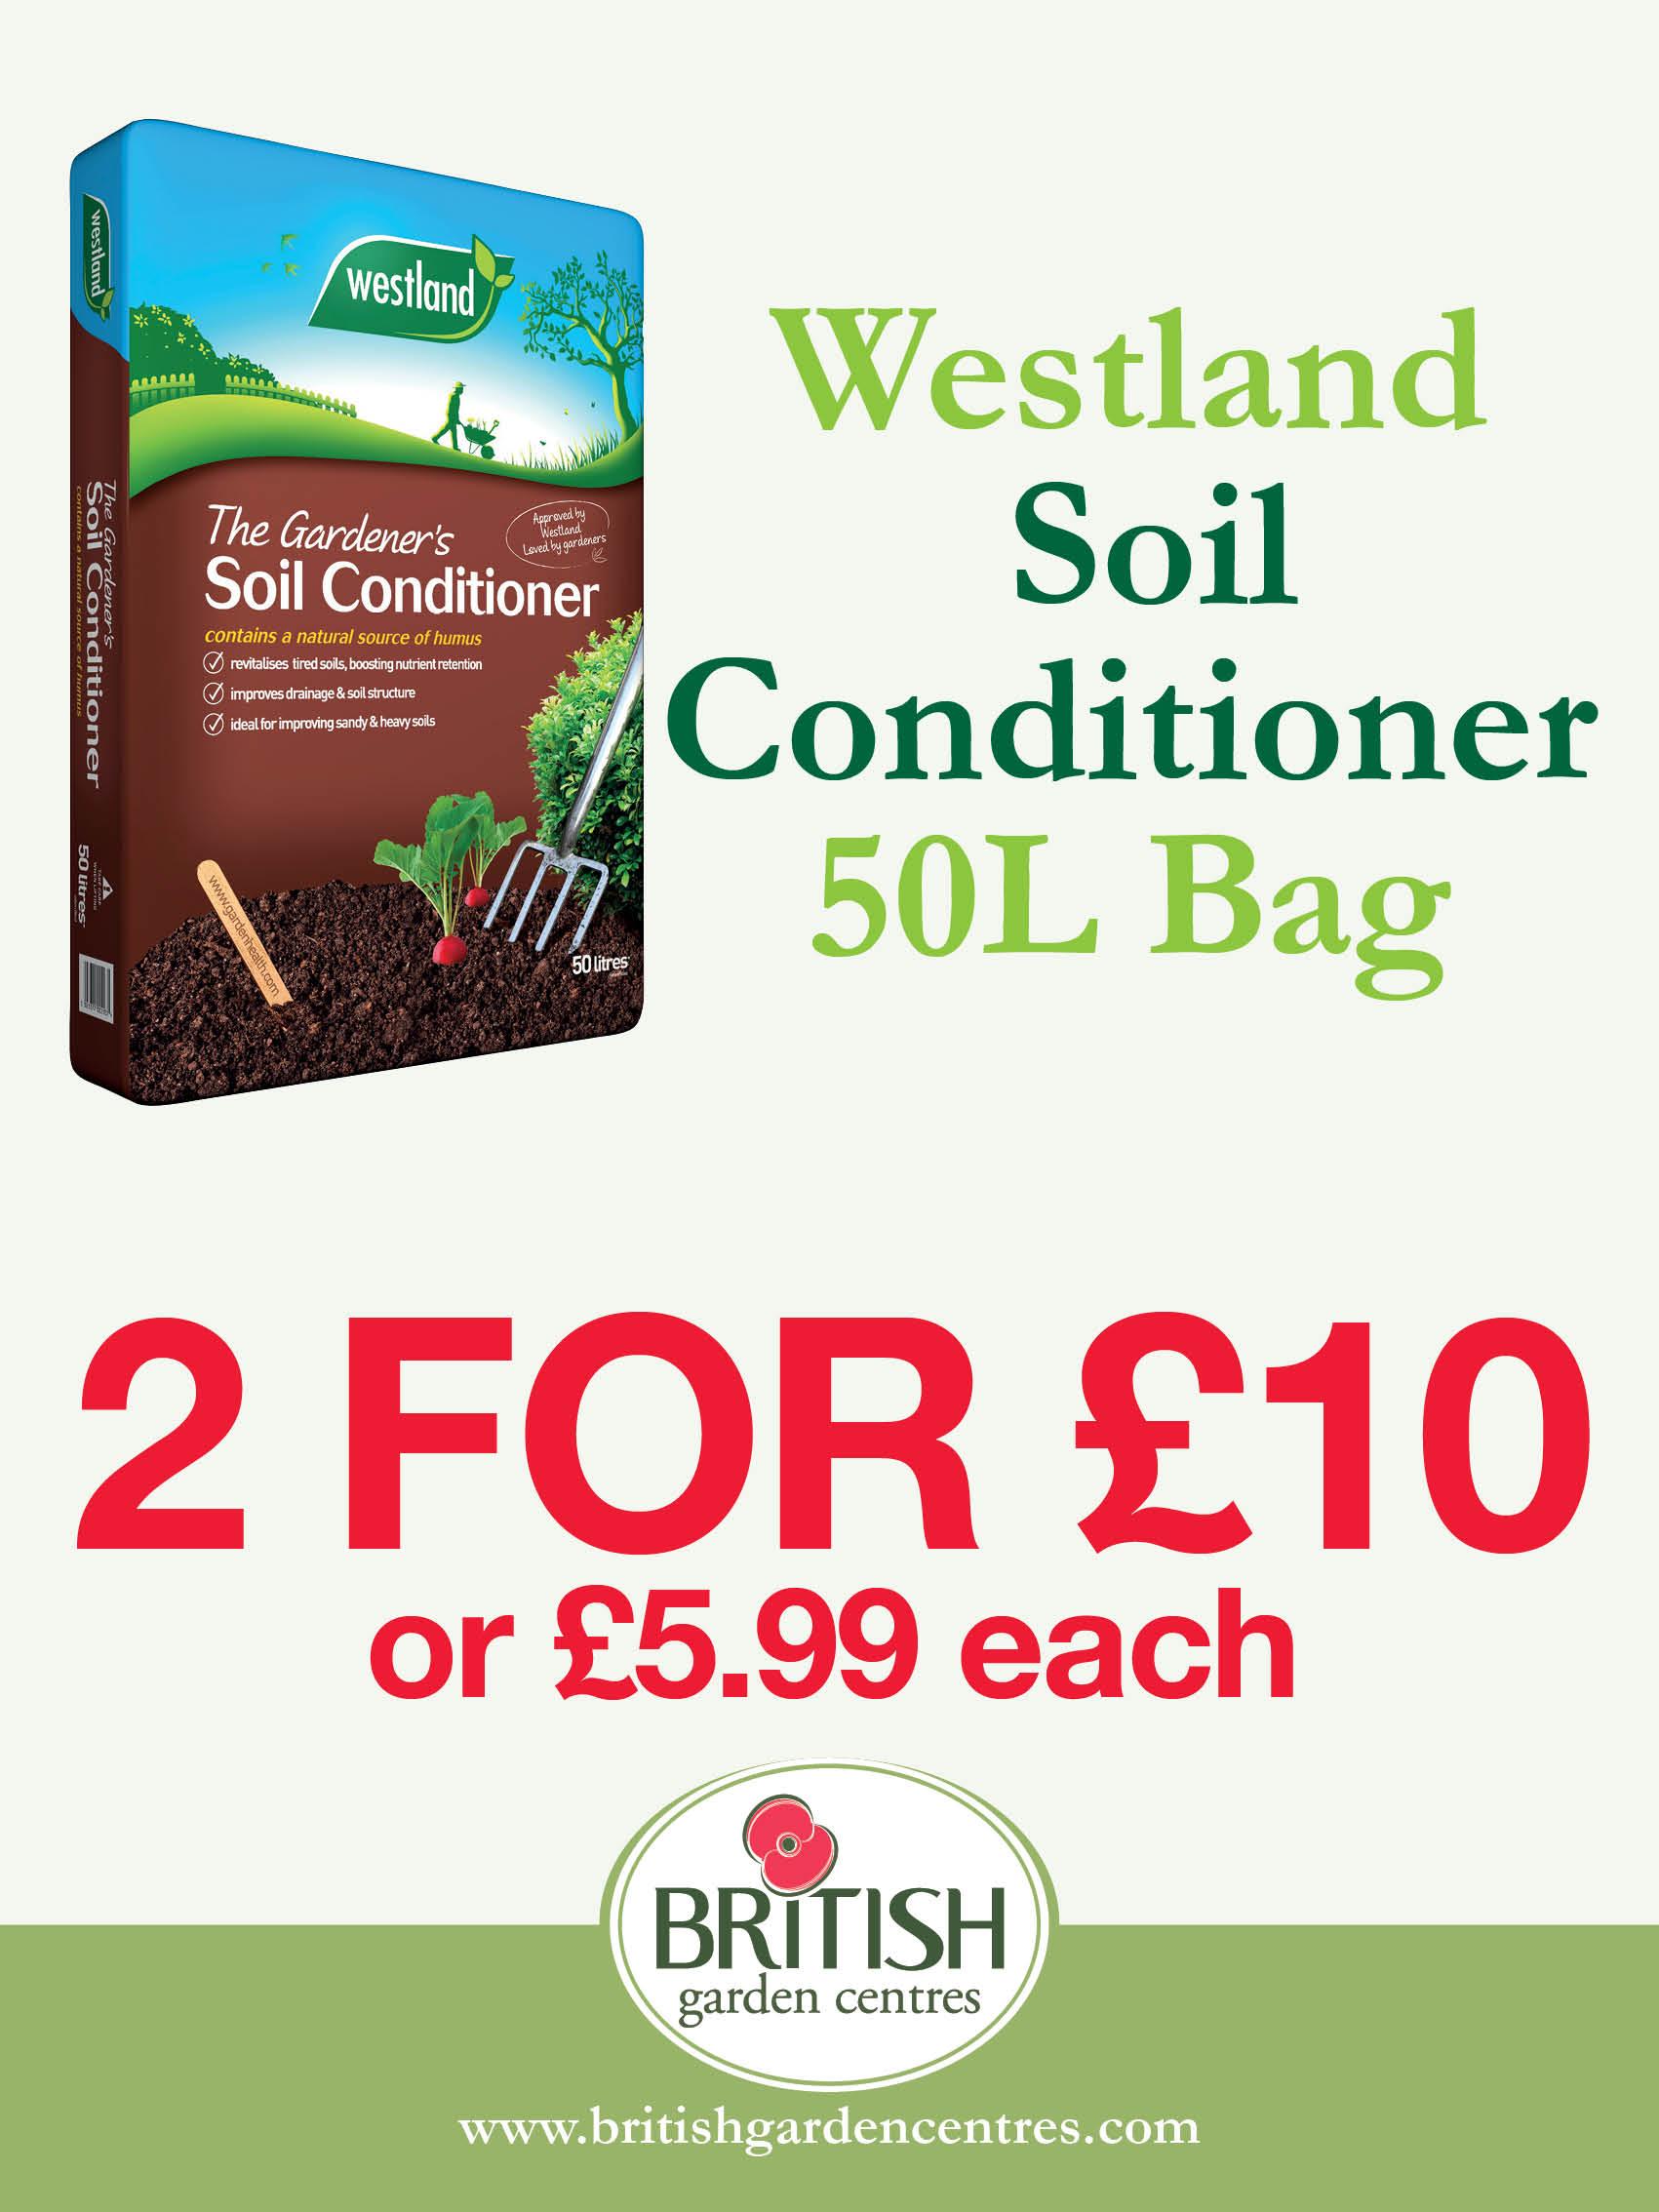 Westland Soil Conditioner 50L